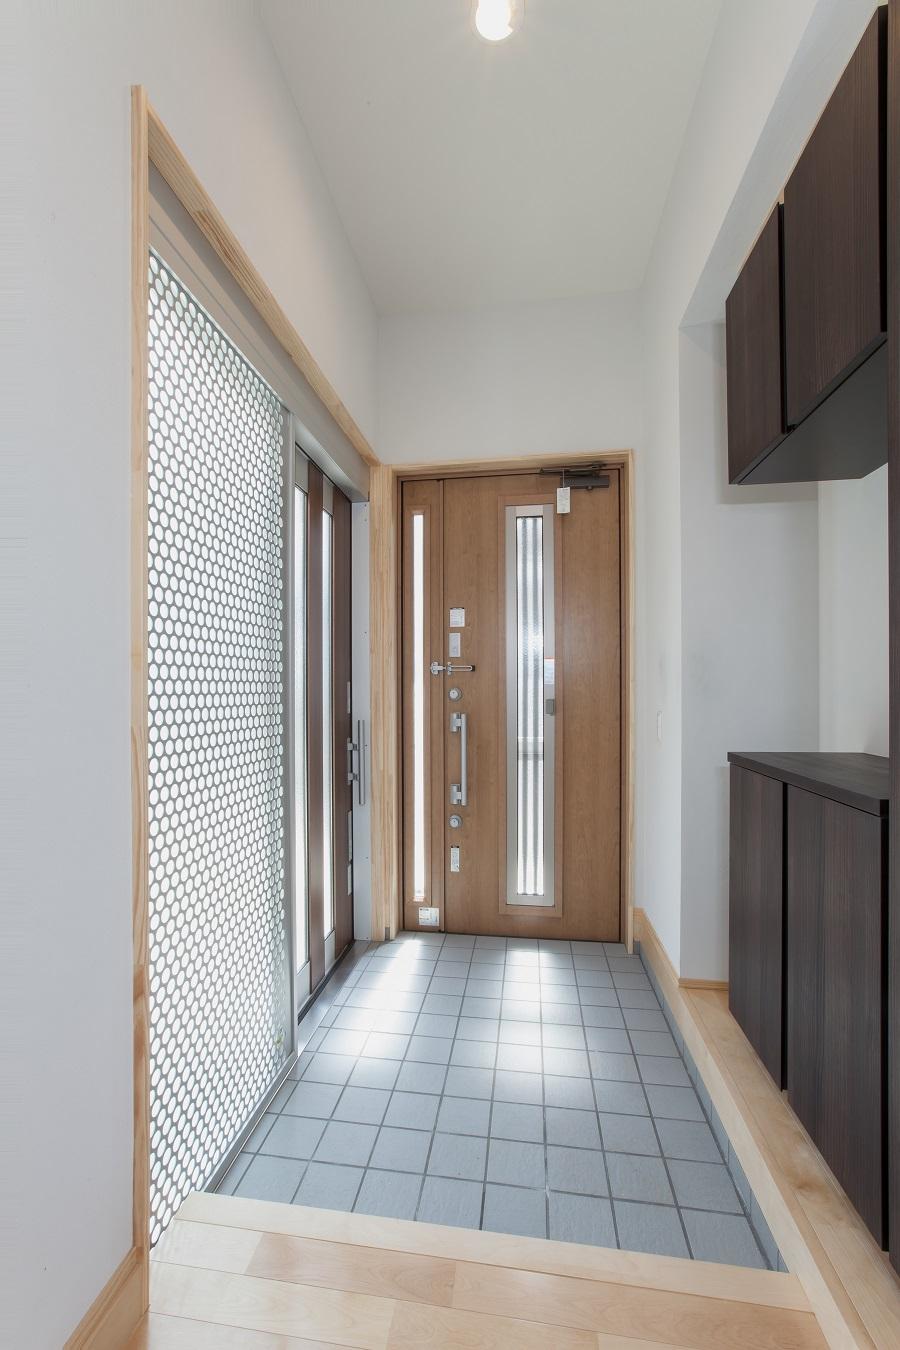 平屋建て 施工事例 玄関1